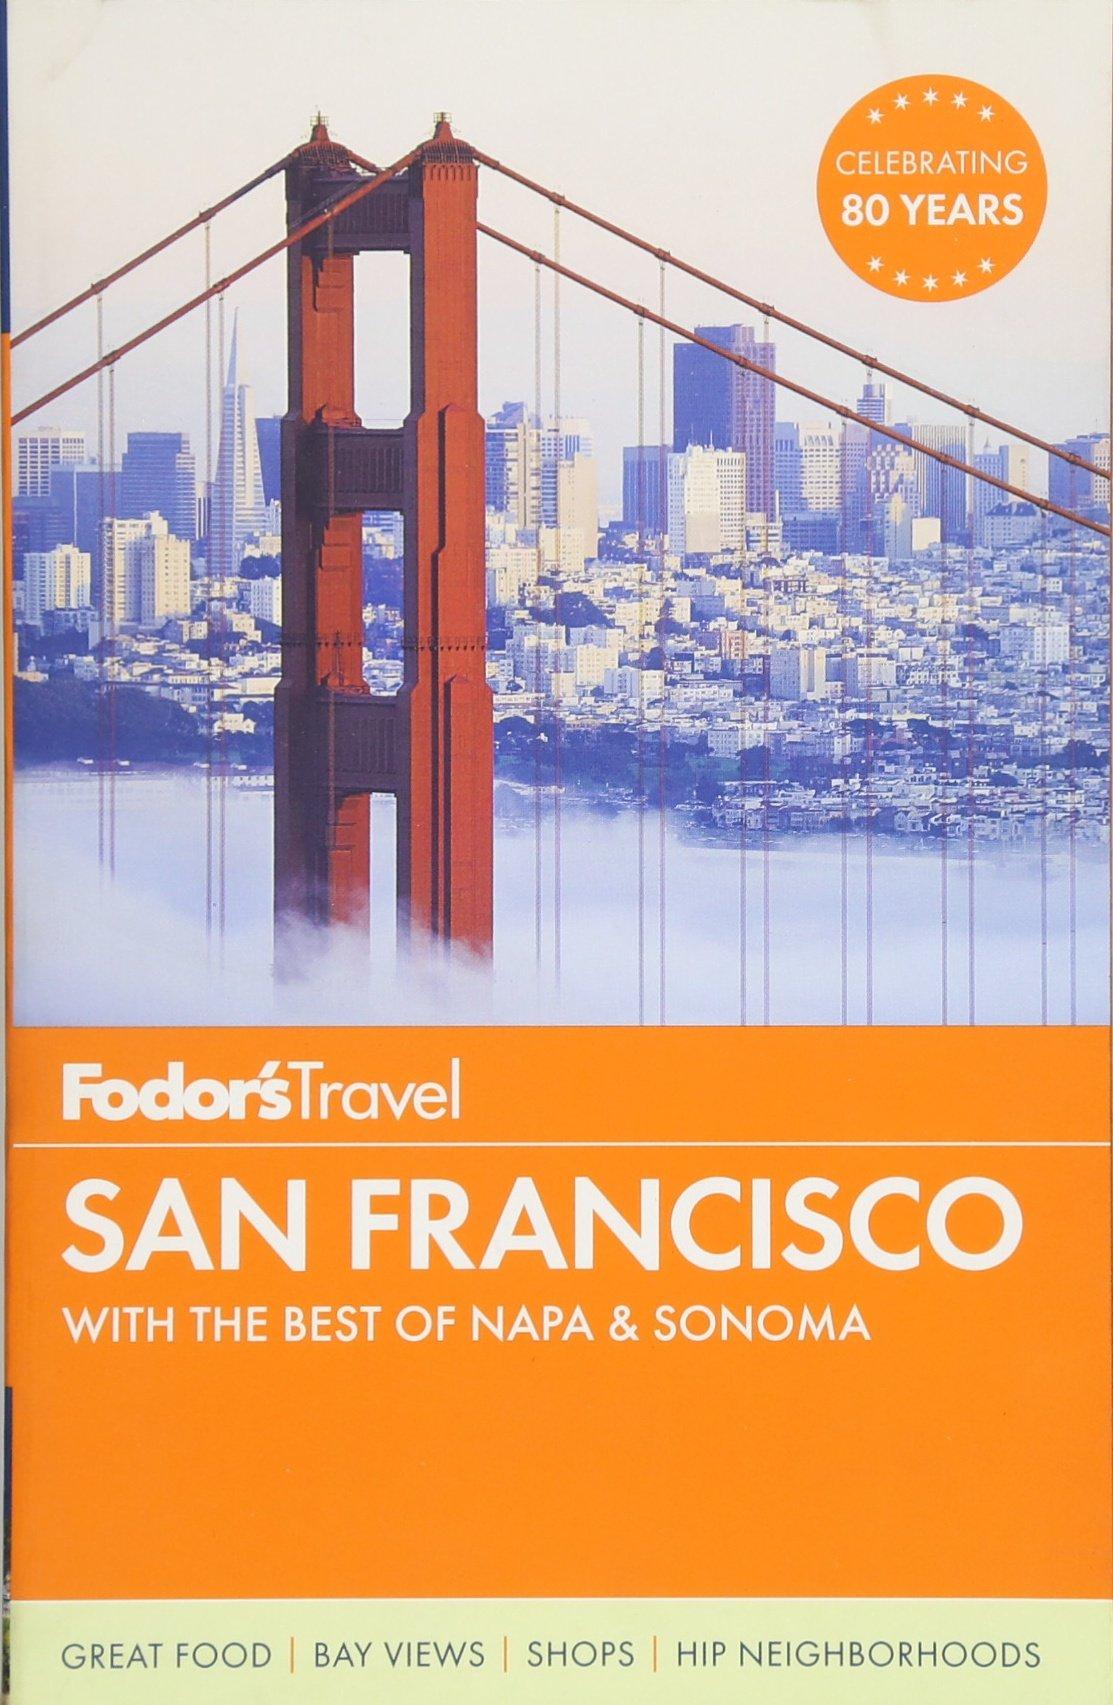 Fodors San Francisco Sonoma Full color product image